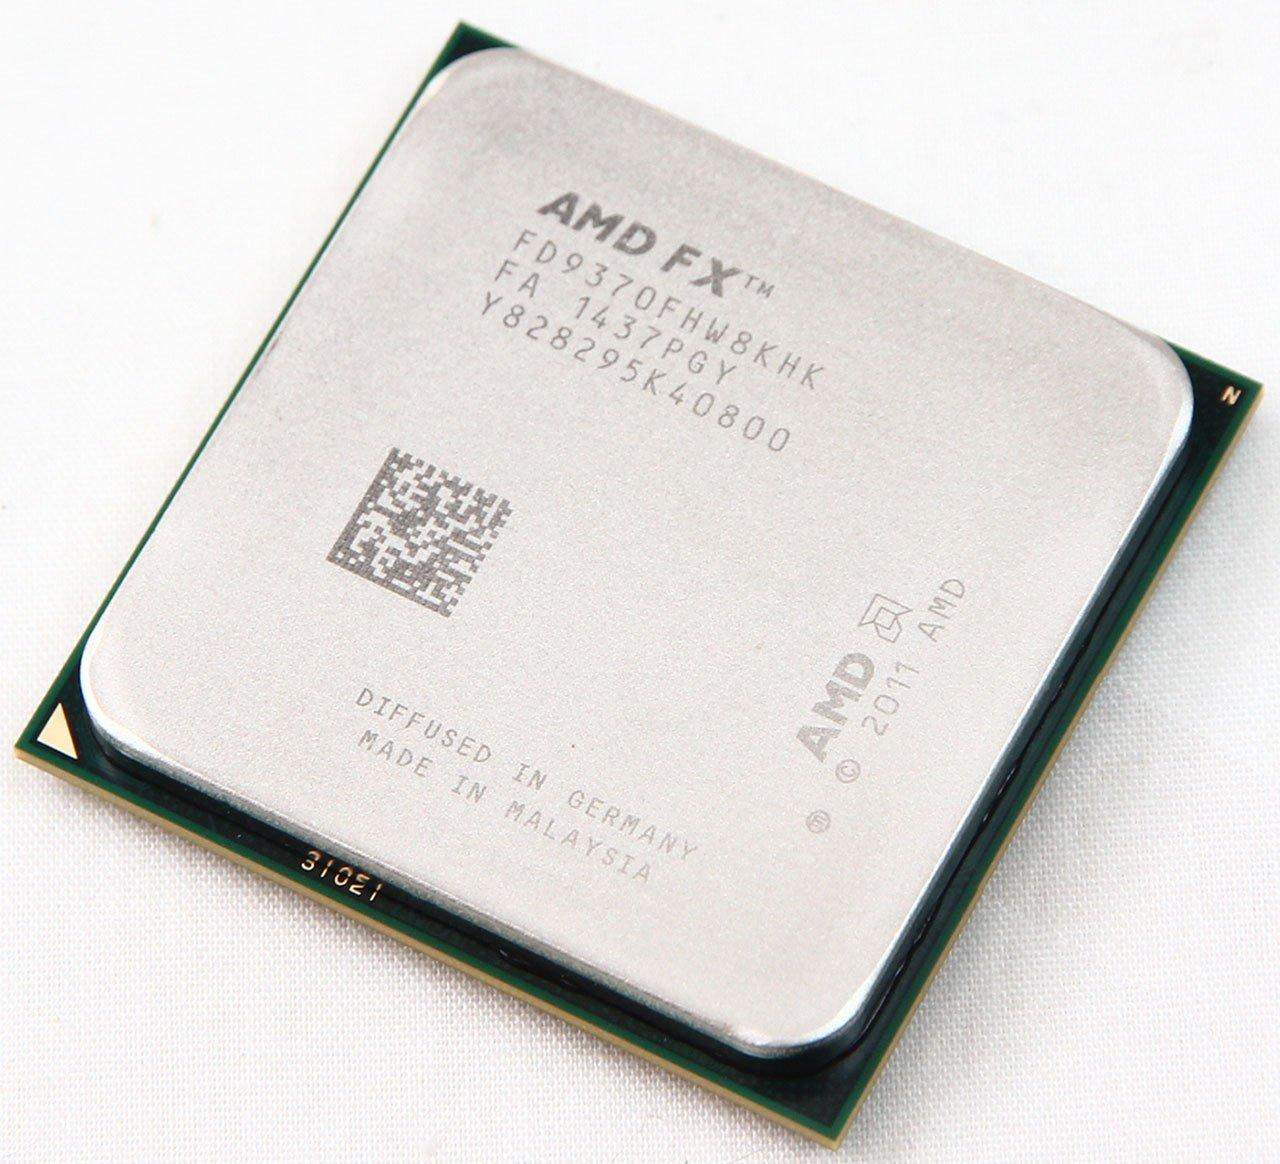 AMD FX-9370 (Vishera) 8-Core Processor Review 4